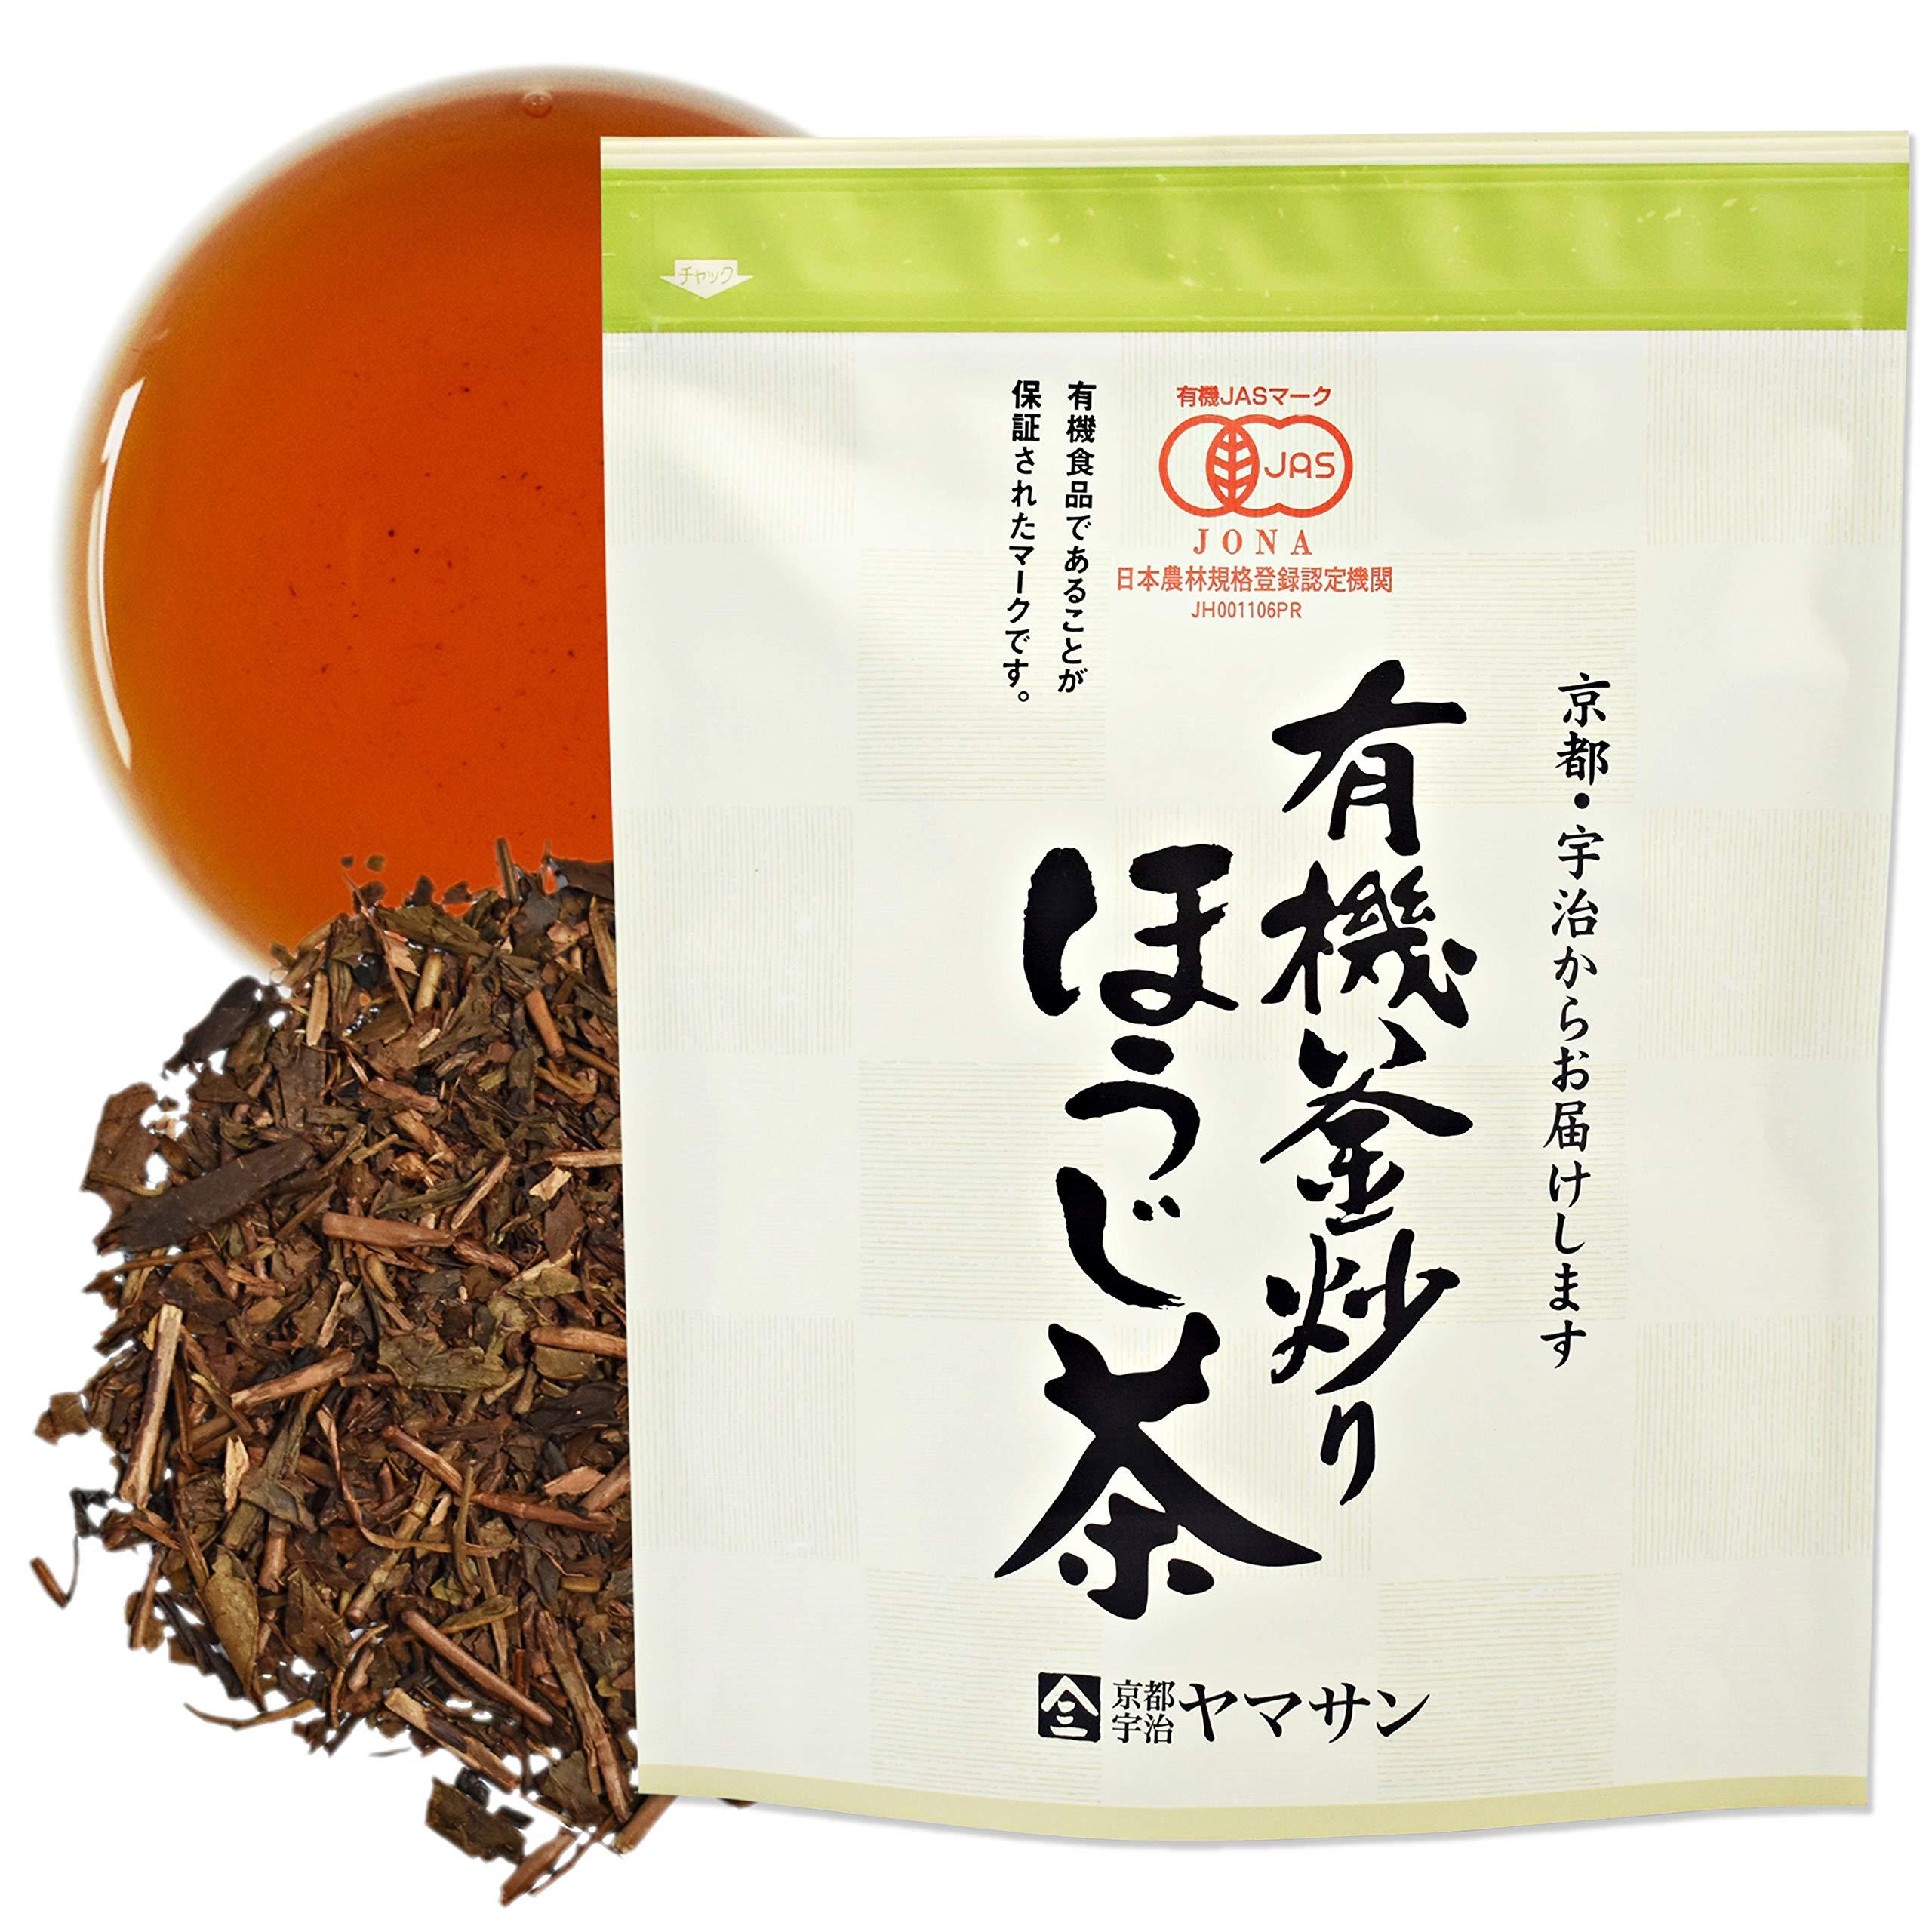 Roasted green Tea Hojicha Organic Low caffeine 150g ,JAS JapaneseTea Houji 【CHAGANJU】